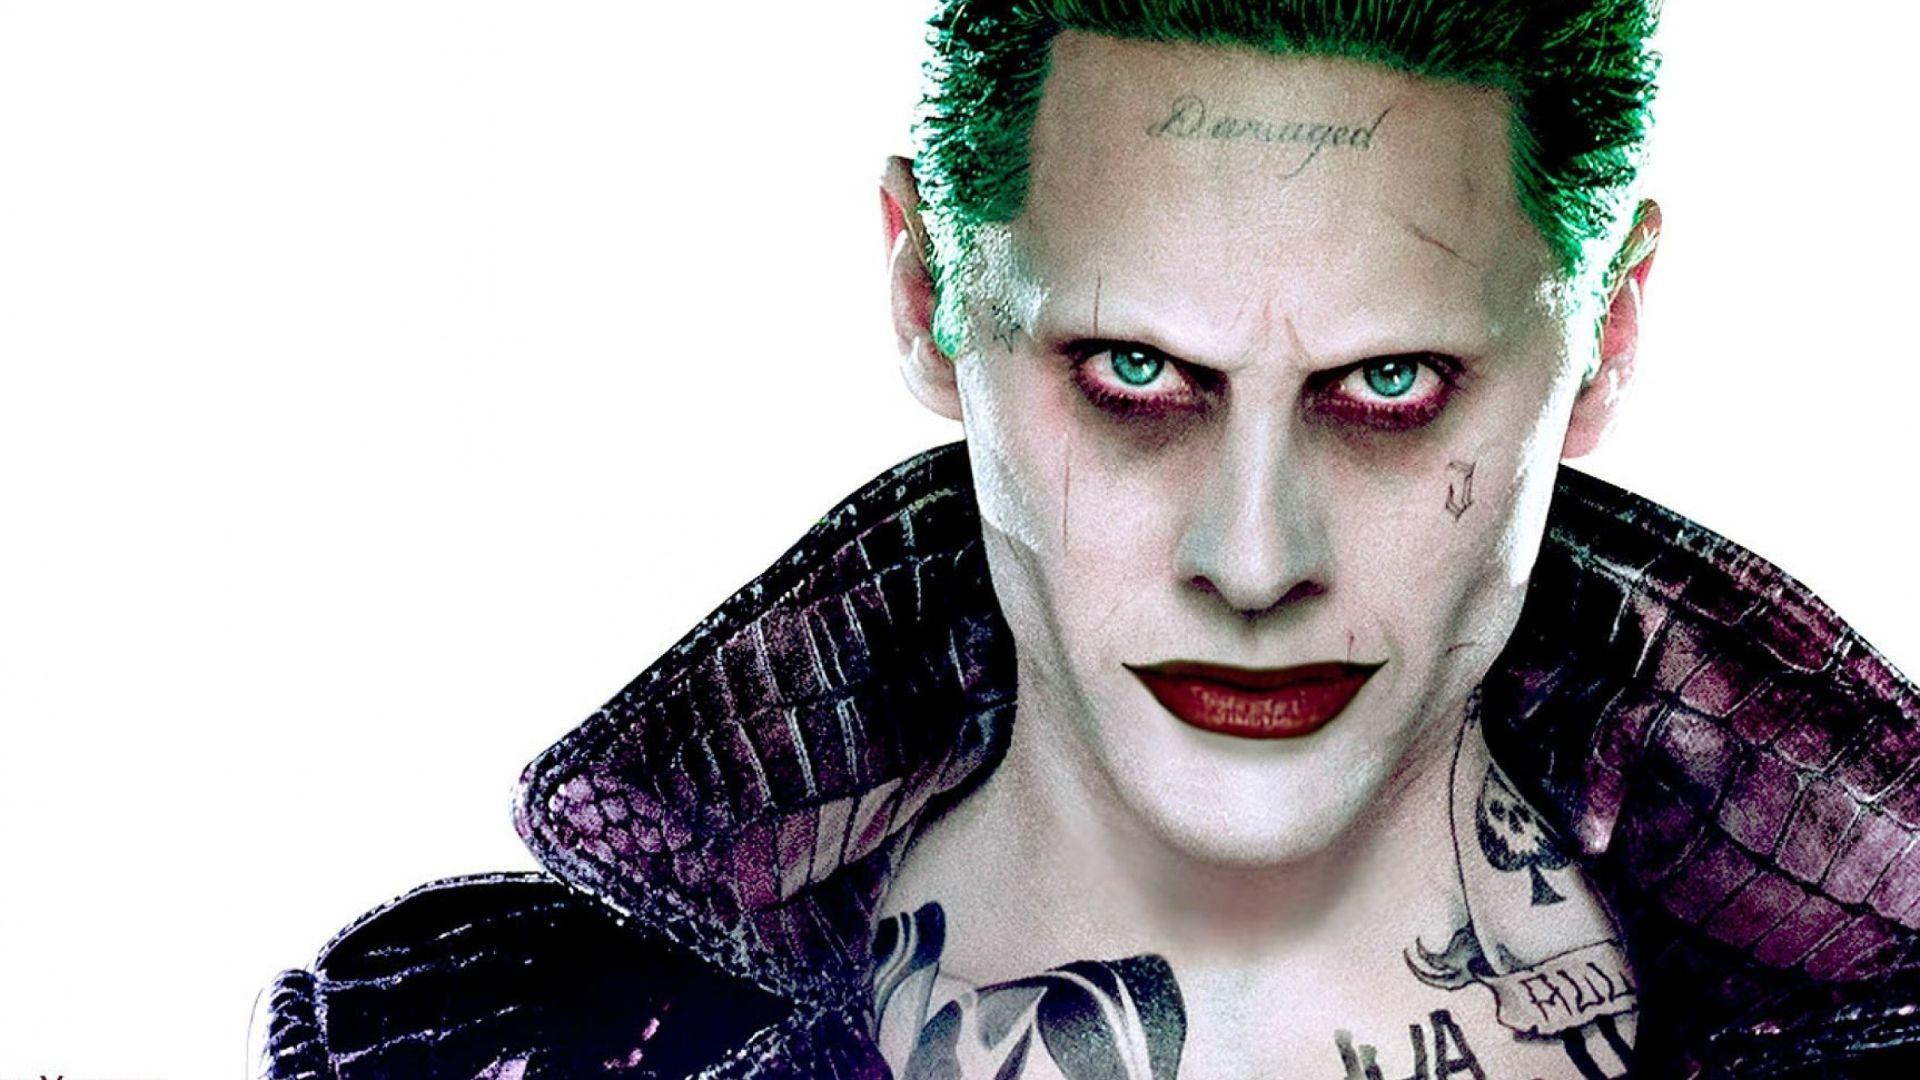 Suicide Squad, Joker Free Download Wallpaper